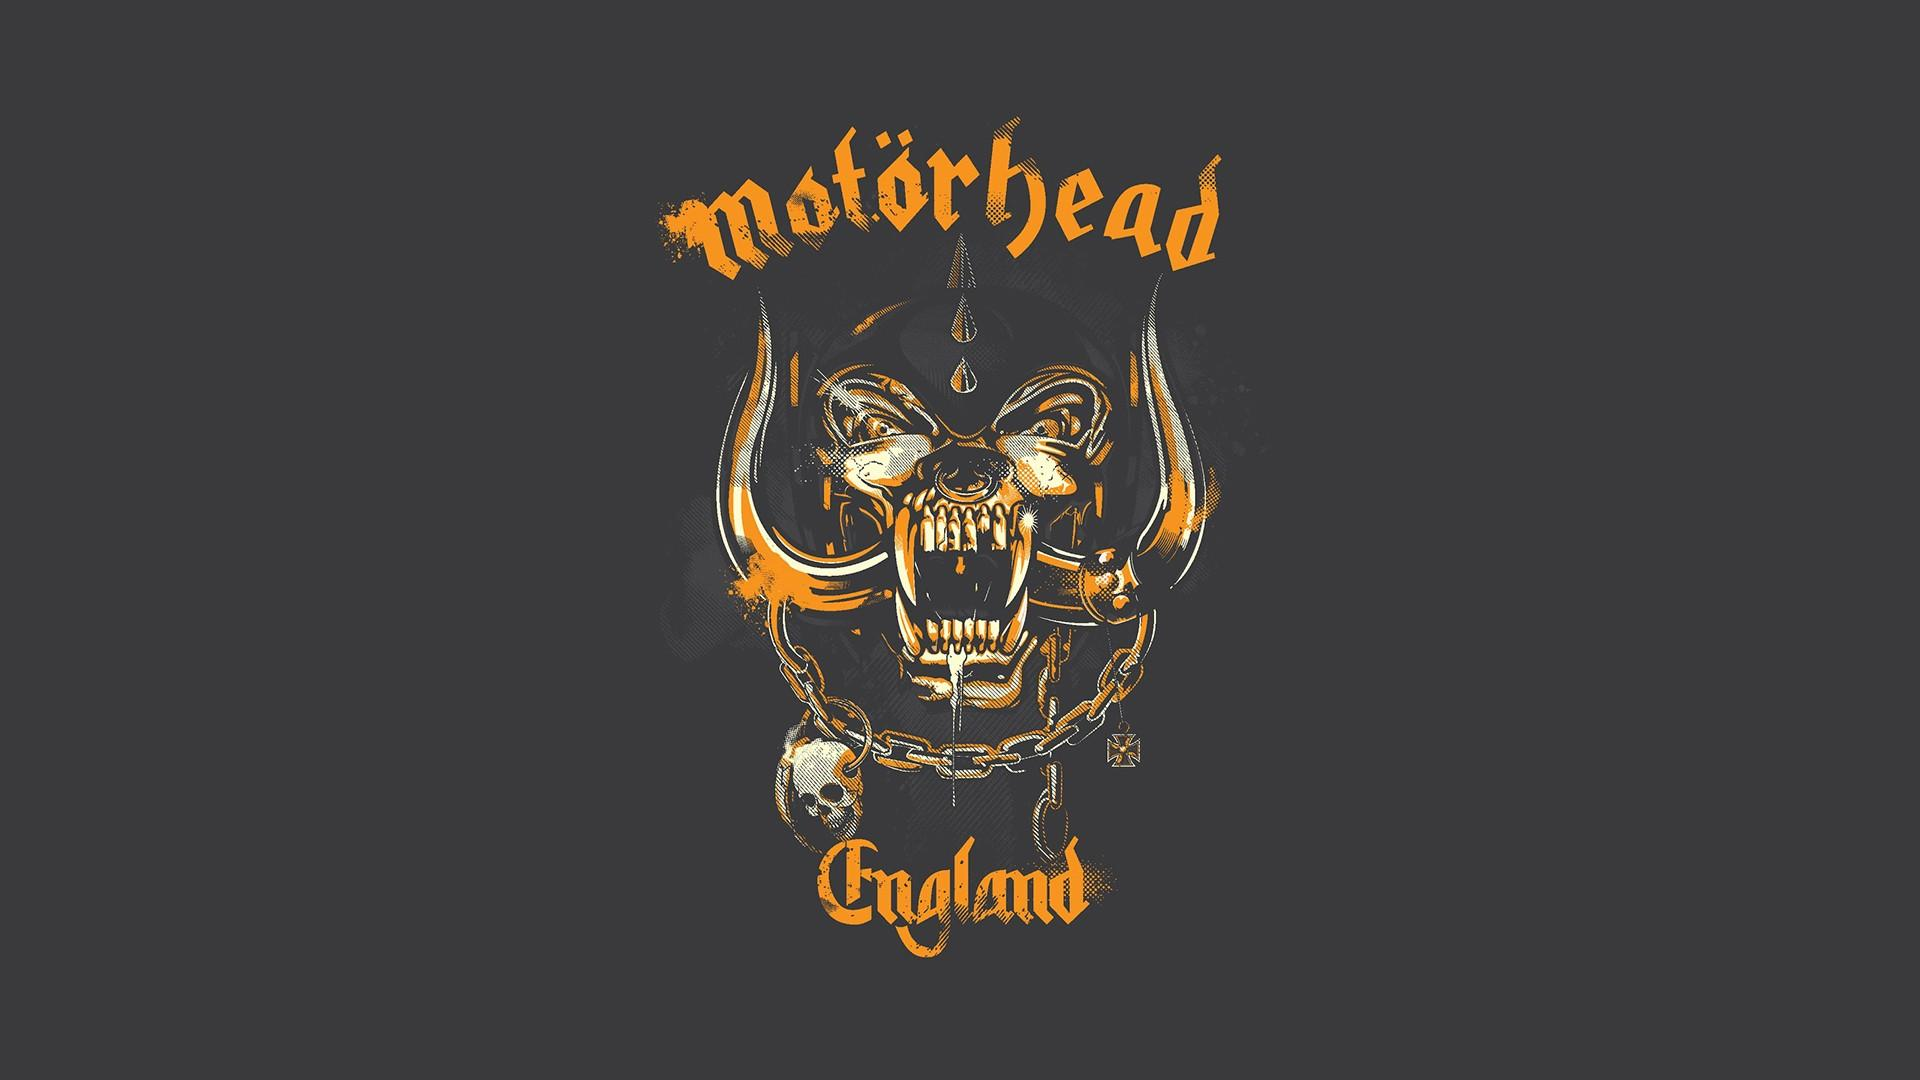 Free Download Yellow Tone Motorhead Logo Hd Desktop Wallpaper